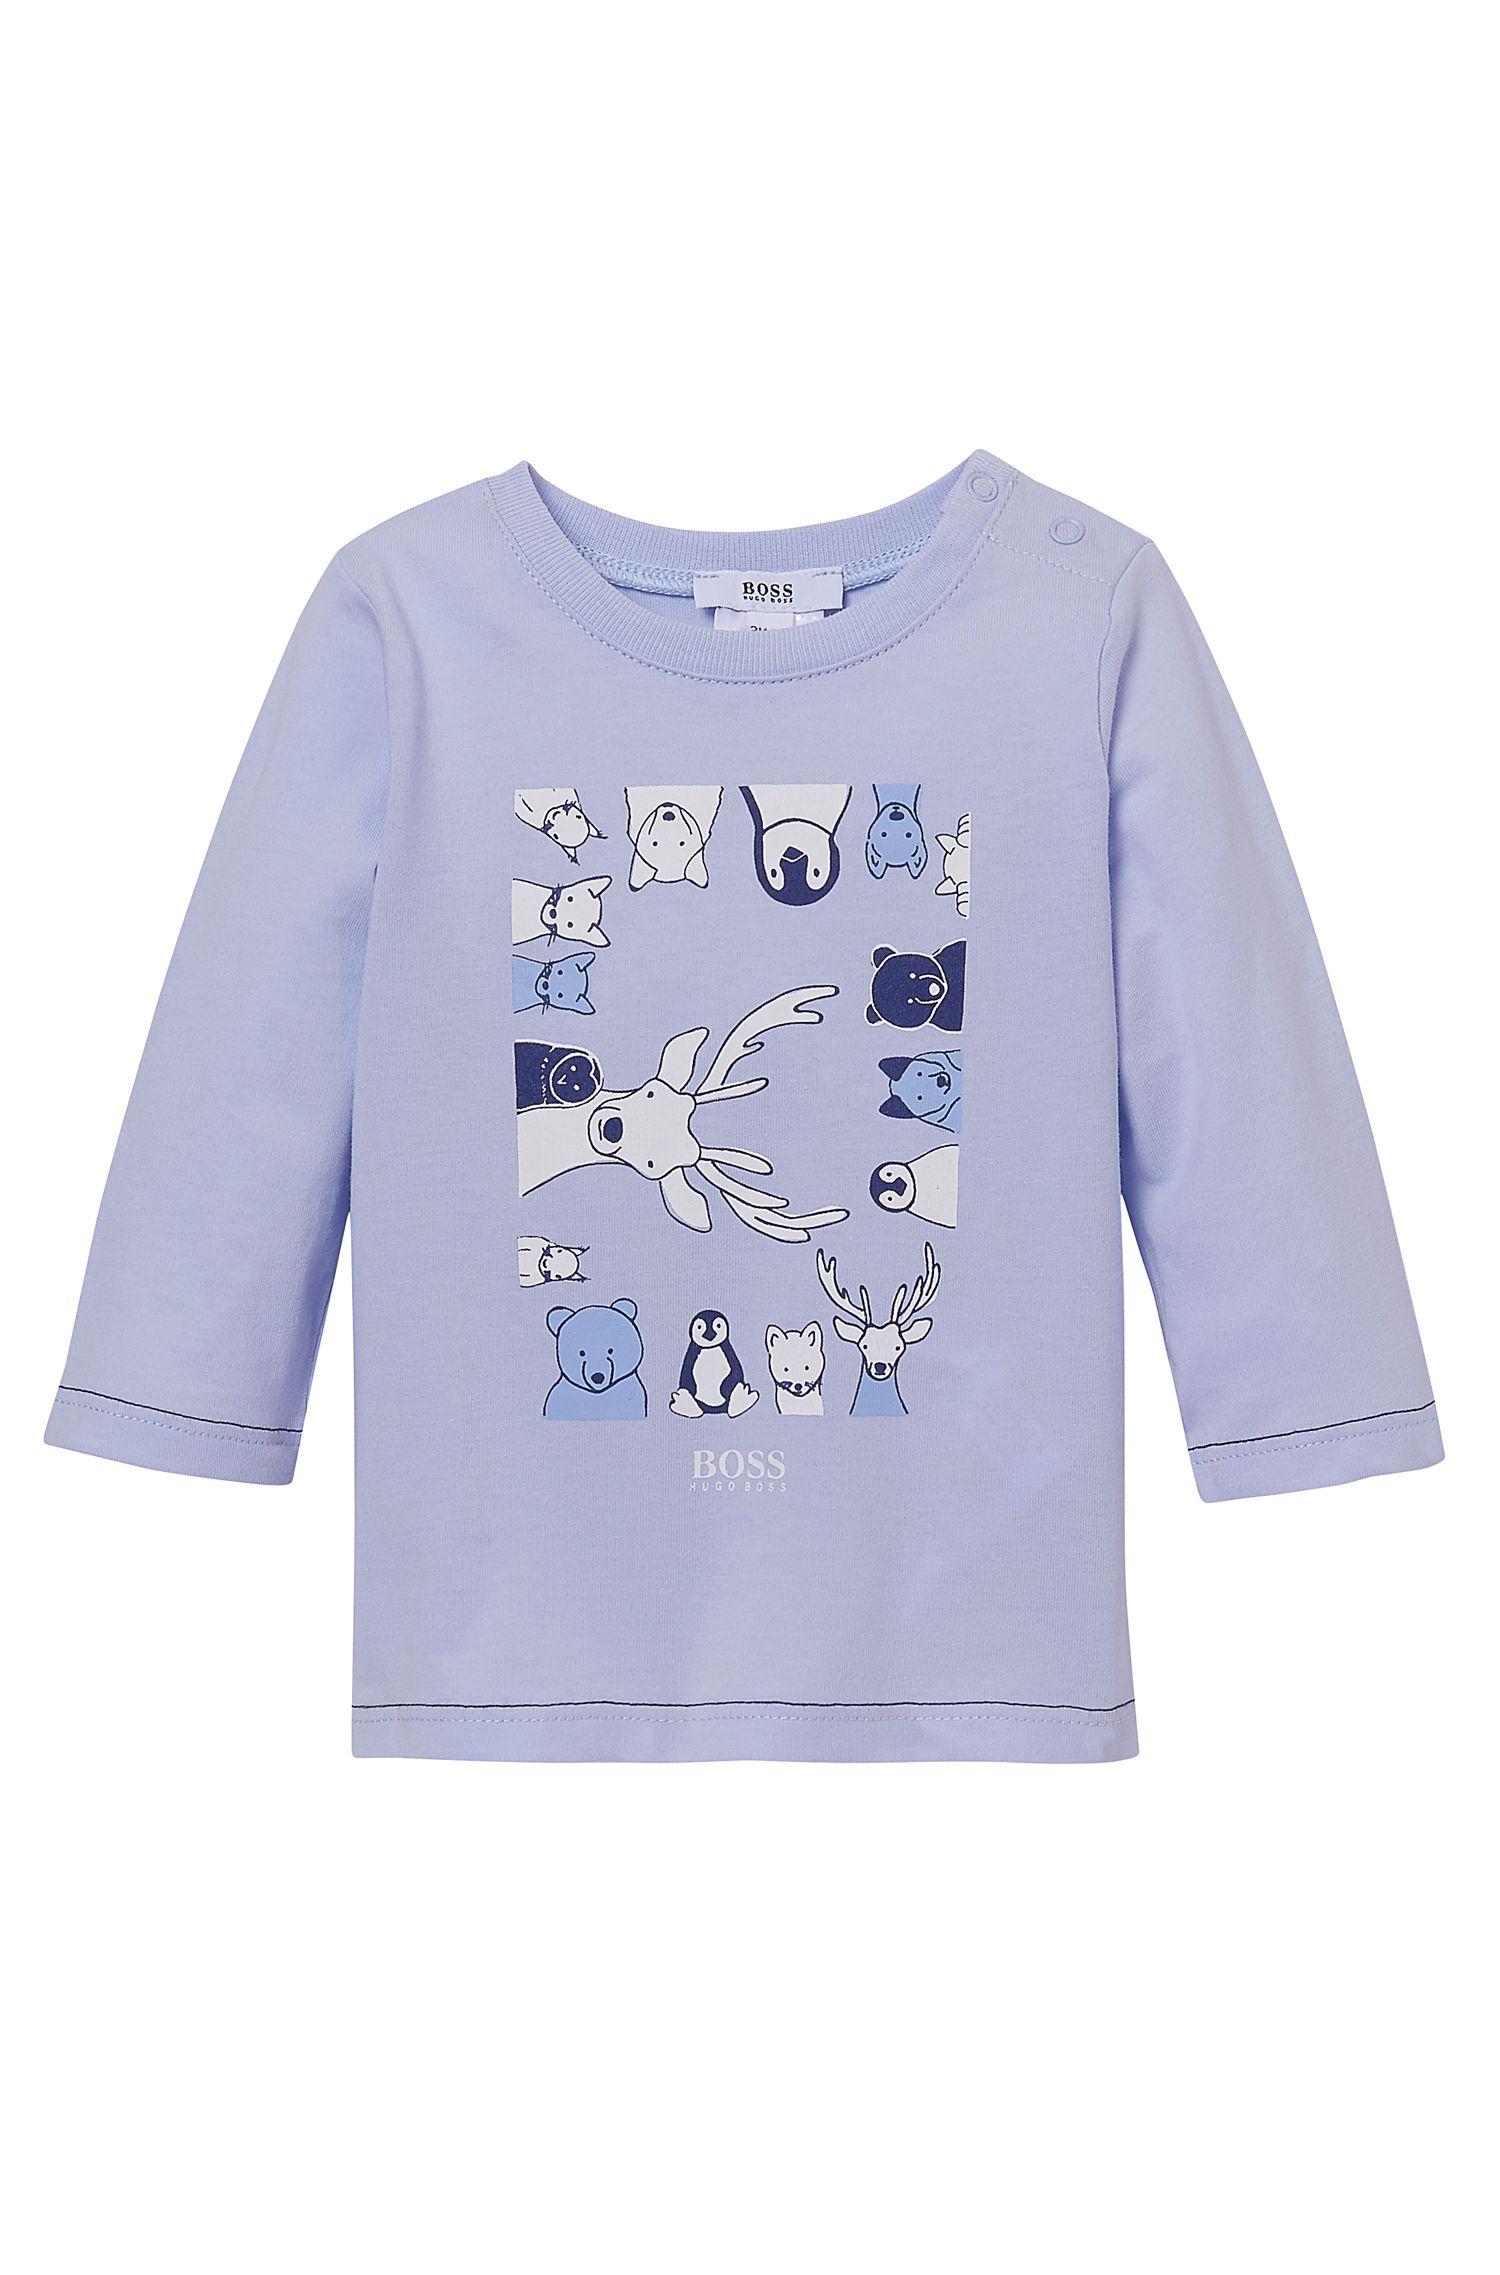 'J95165' | Newborn Animal T-Shirt